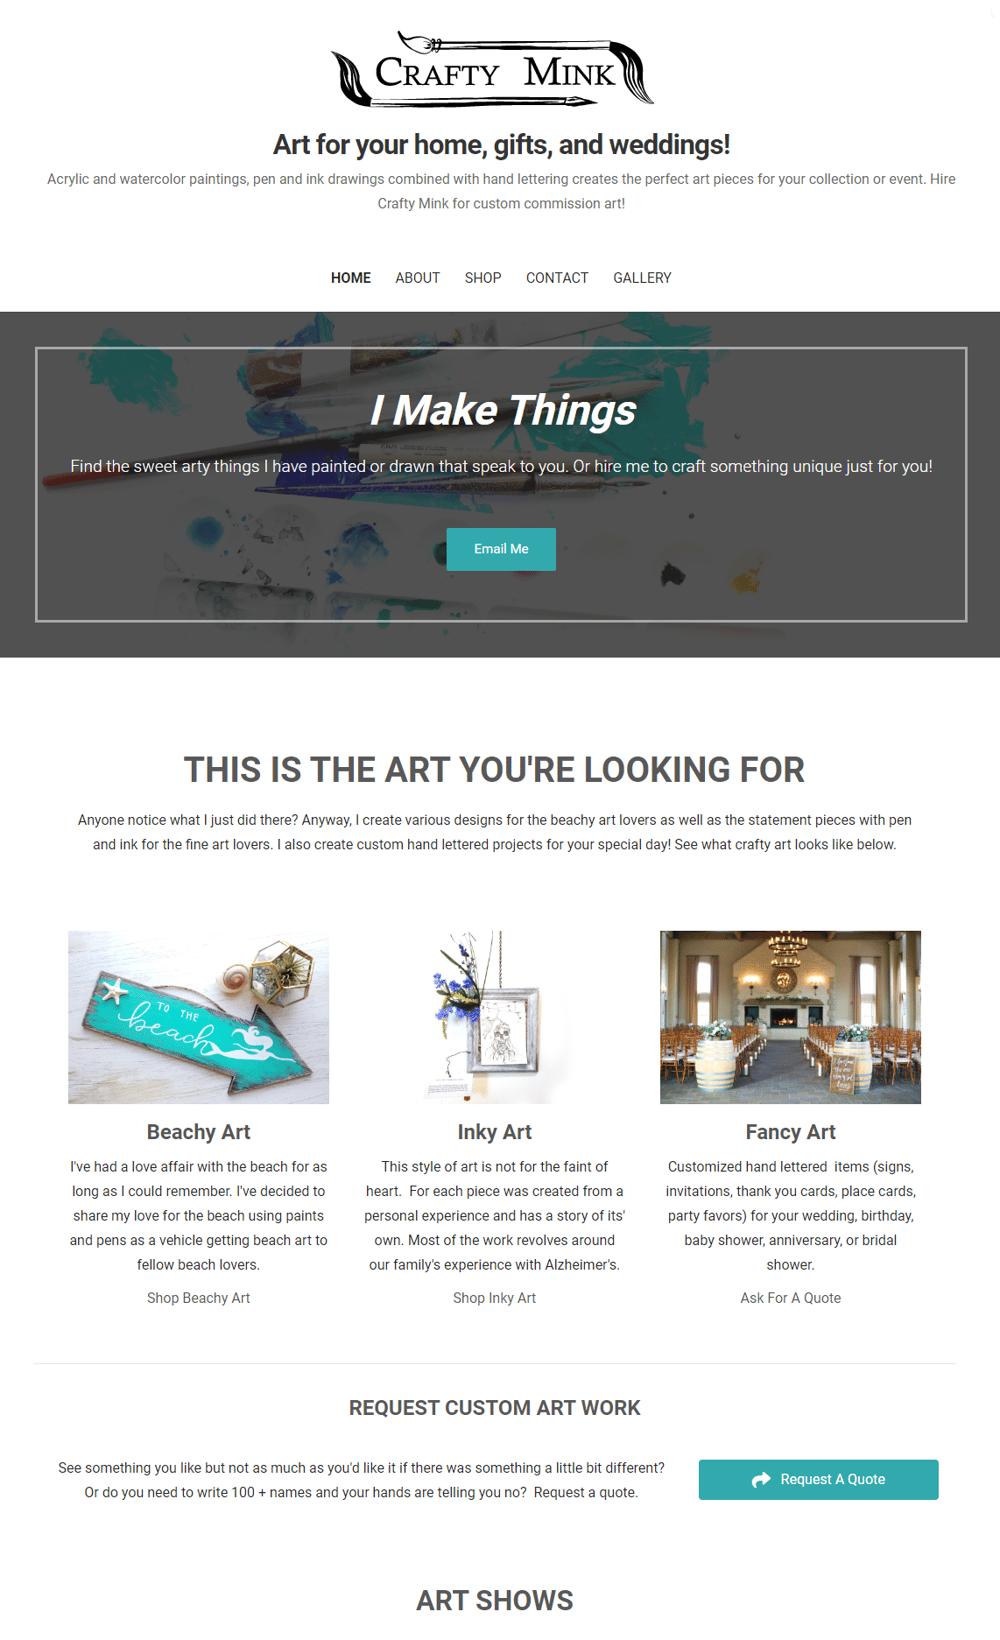 Crafty Mink - An artist's website: craftymink.com - image 1 - student project